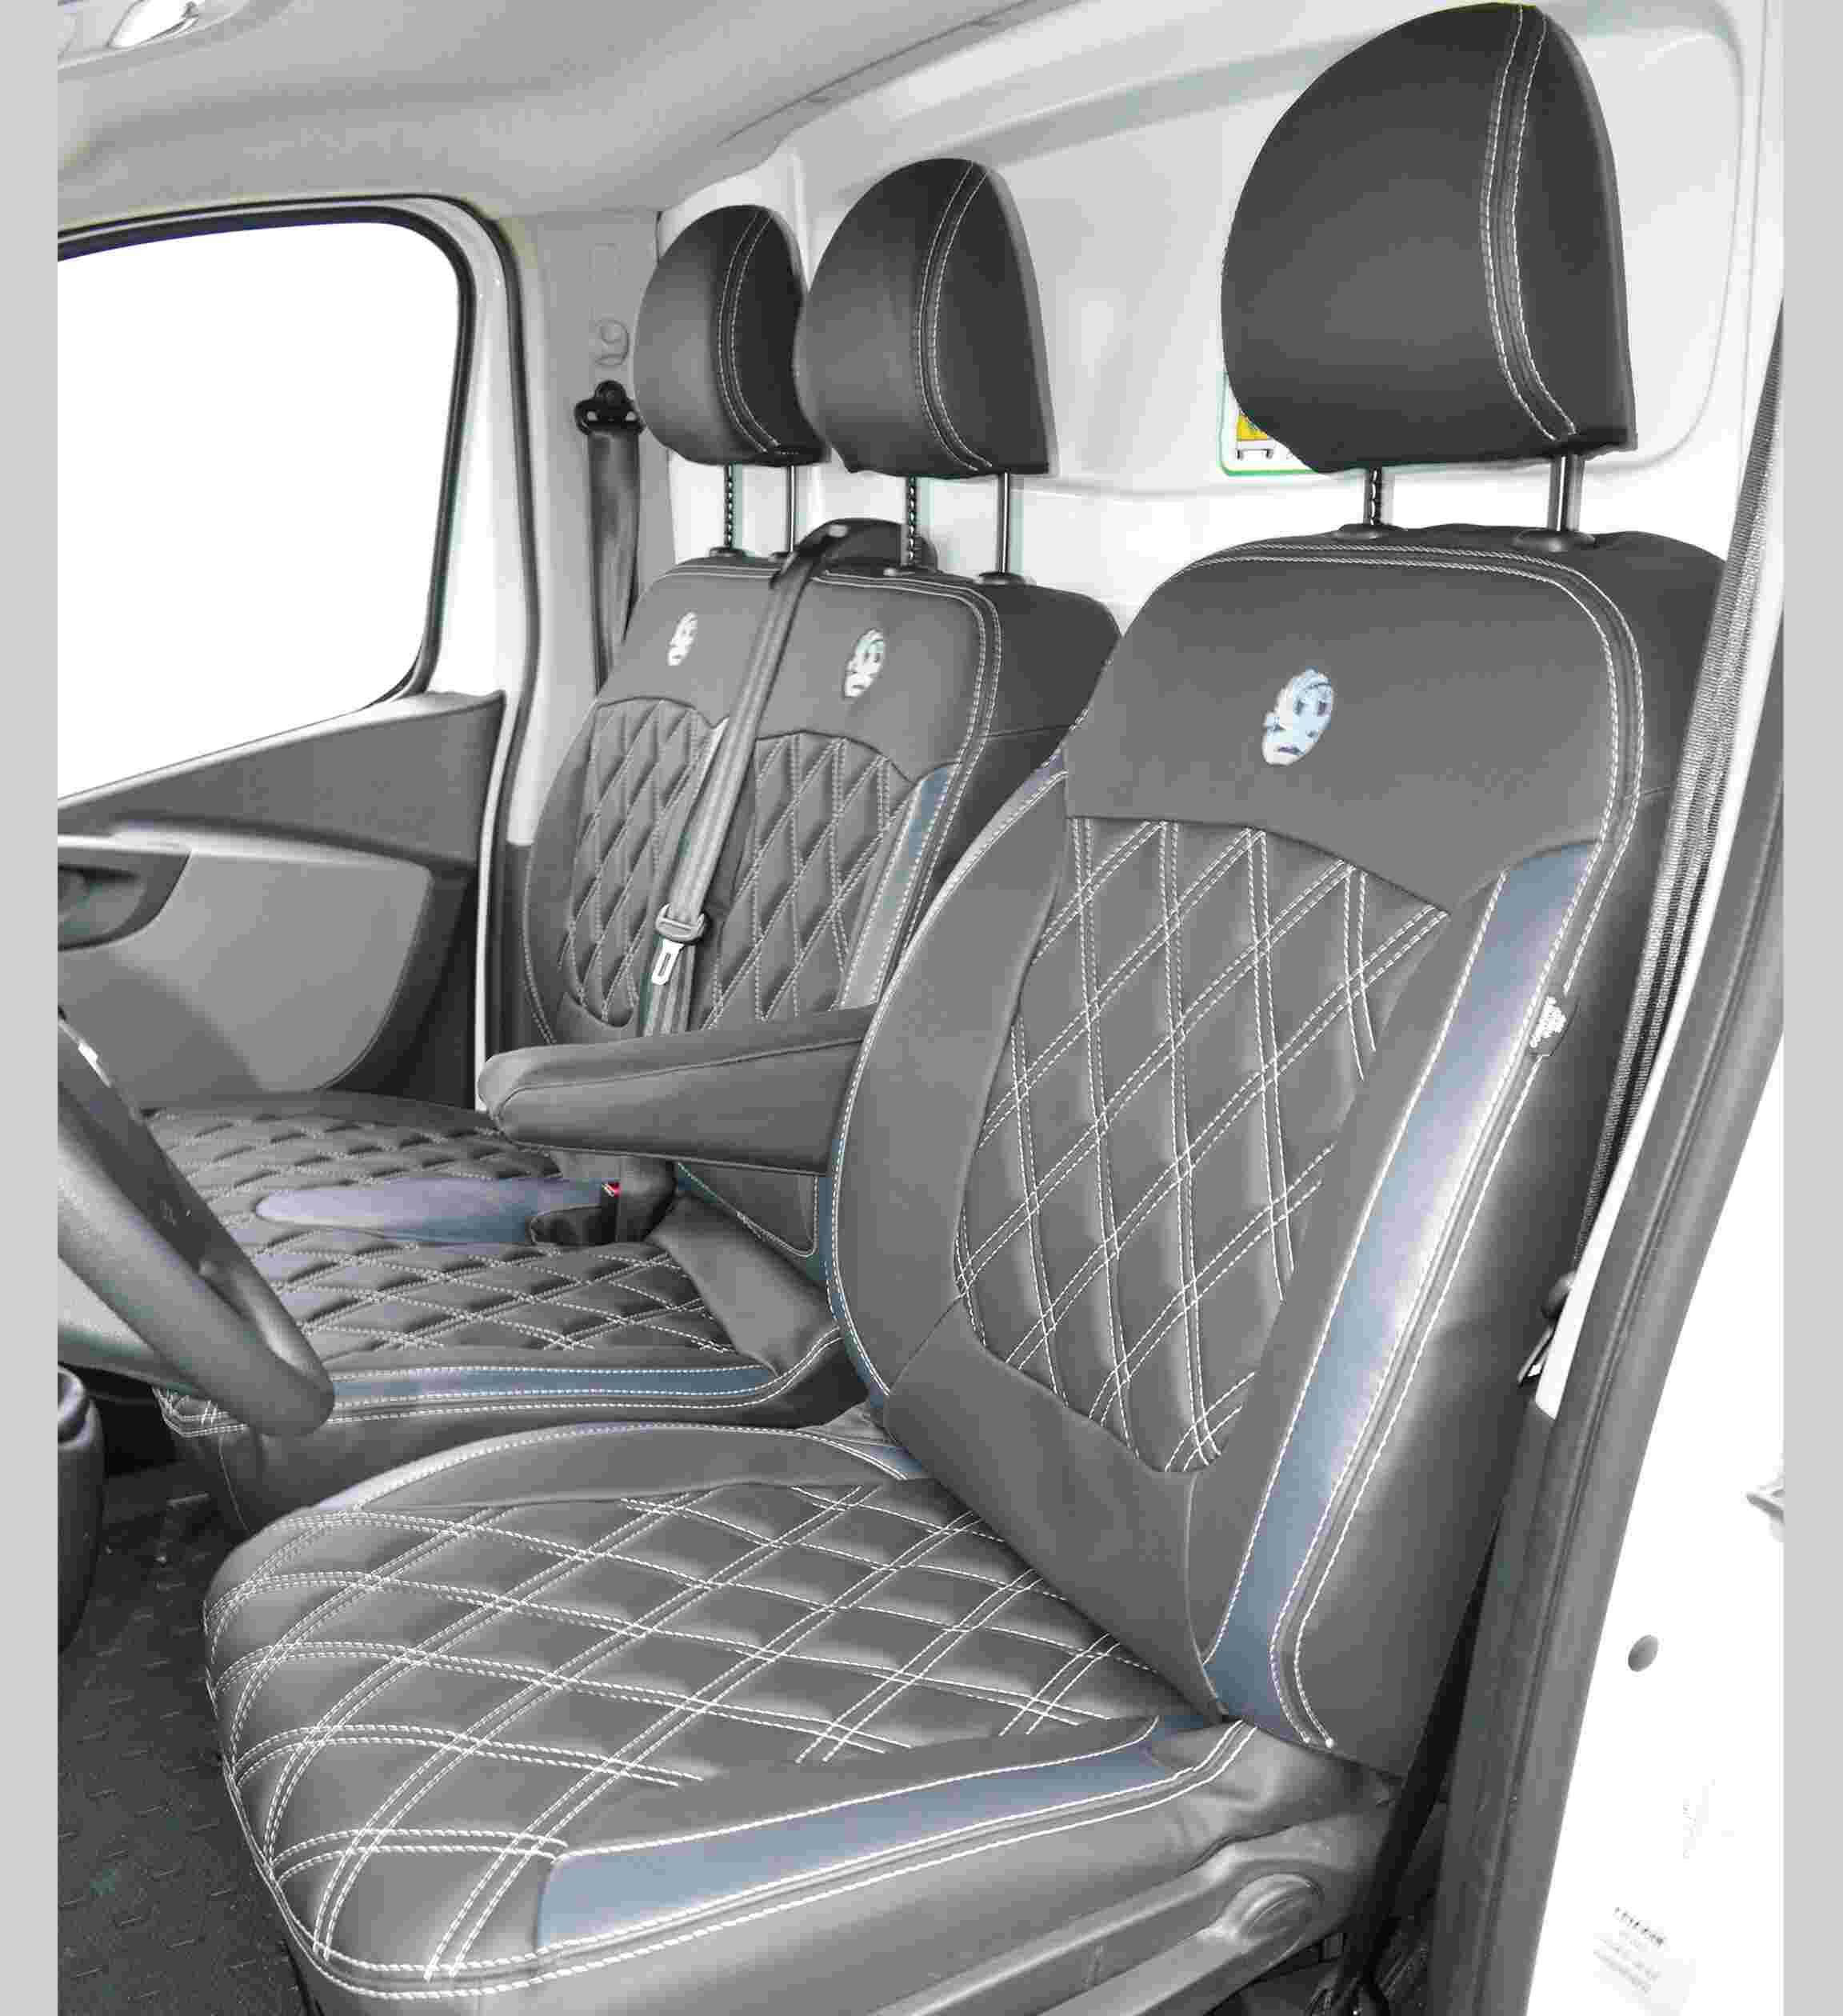 NISSAN PRIMASTAR 02-ON DELUXE RACING BLUE 2+1 VAN SEAT COVERS HEAVY DUTY